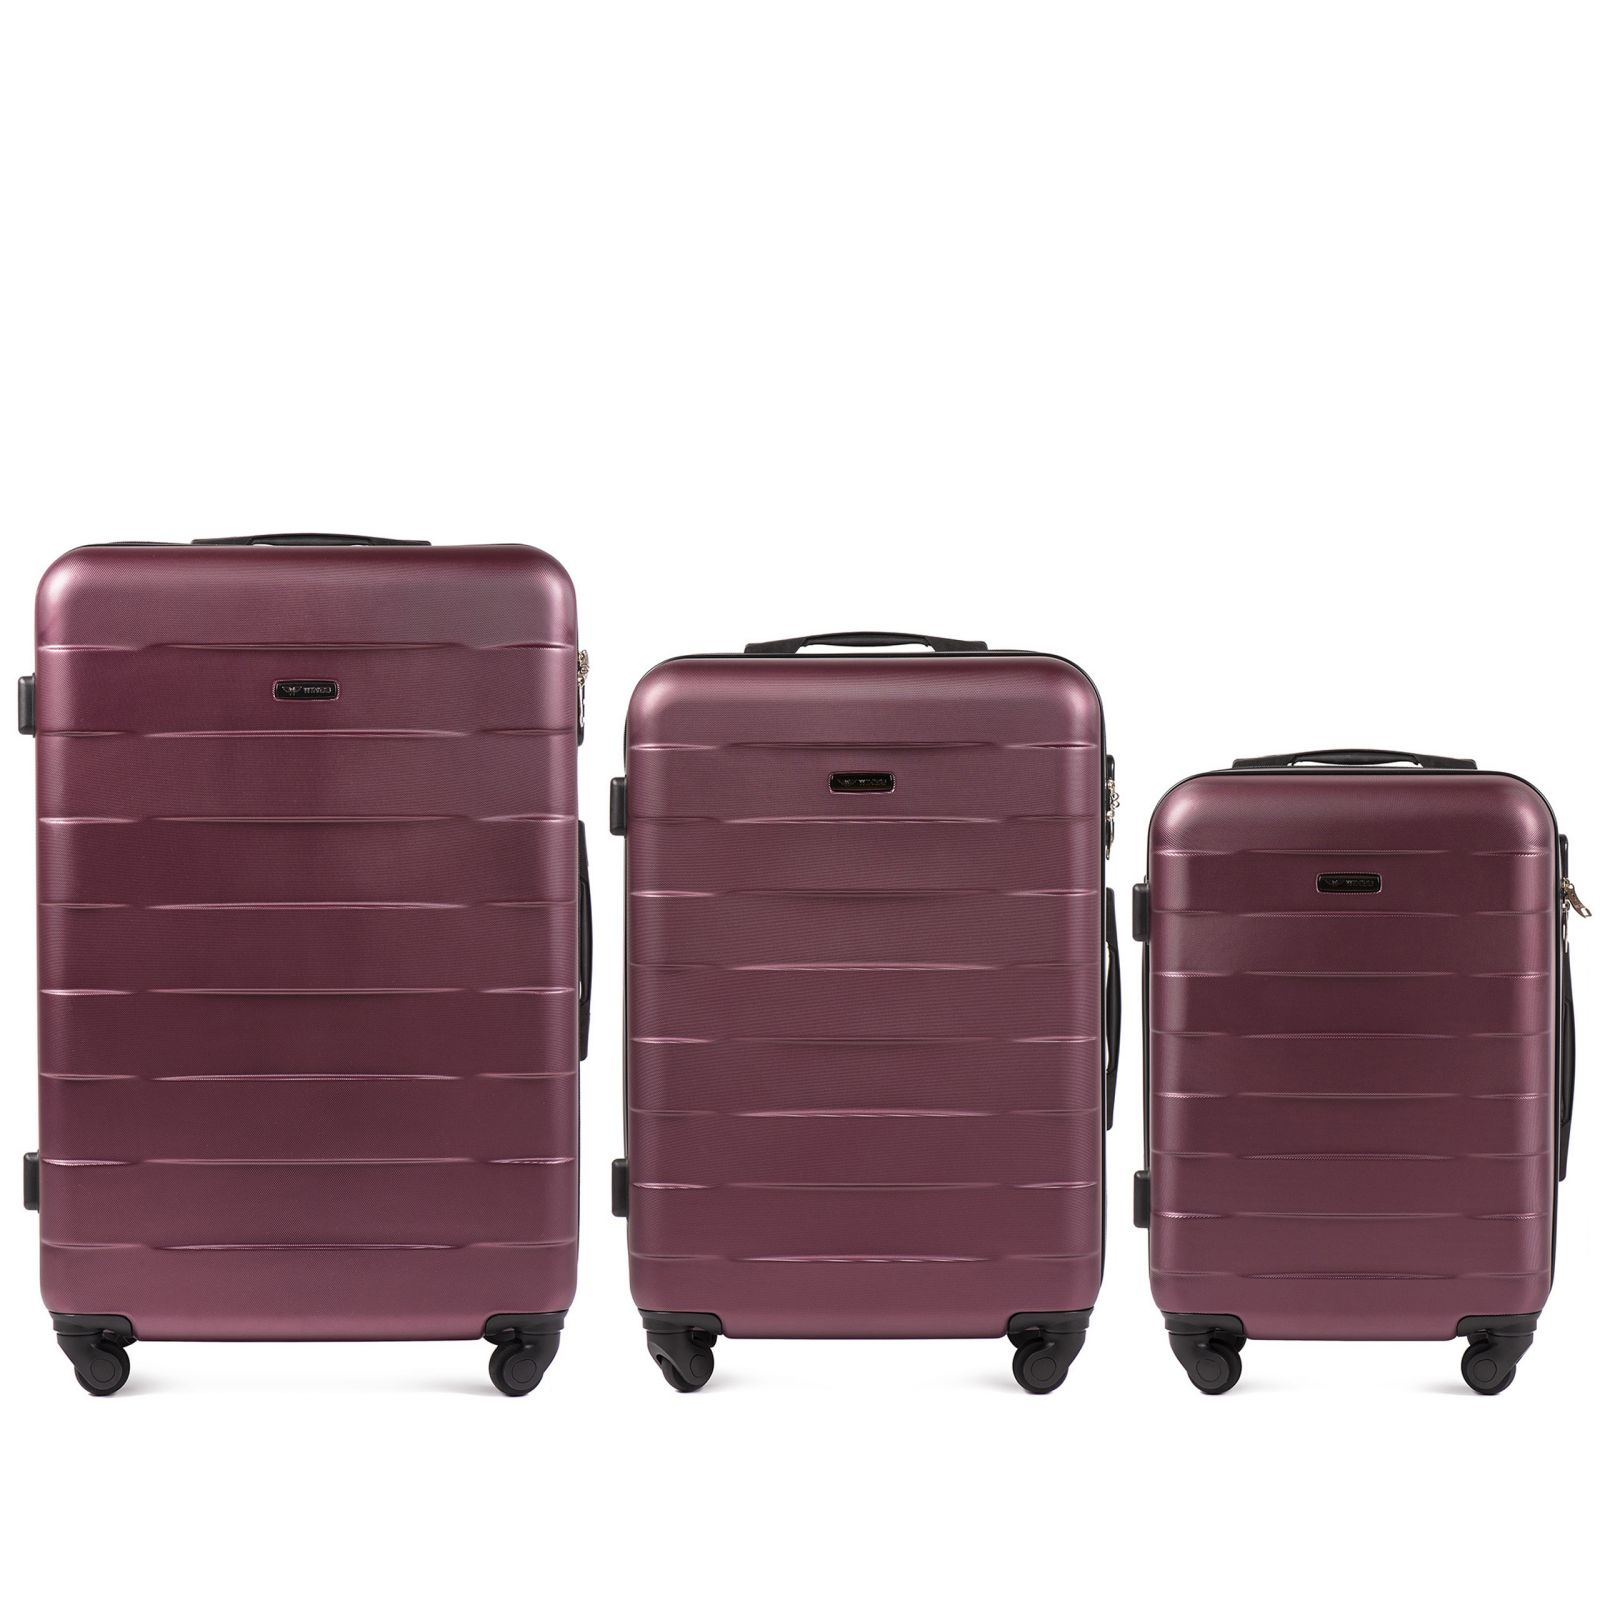 Cestovní kufry sada WINGS CAMARO ABS BURGUNDY L,M,S